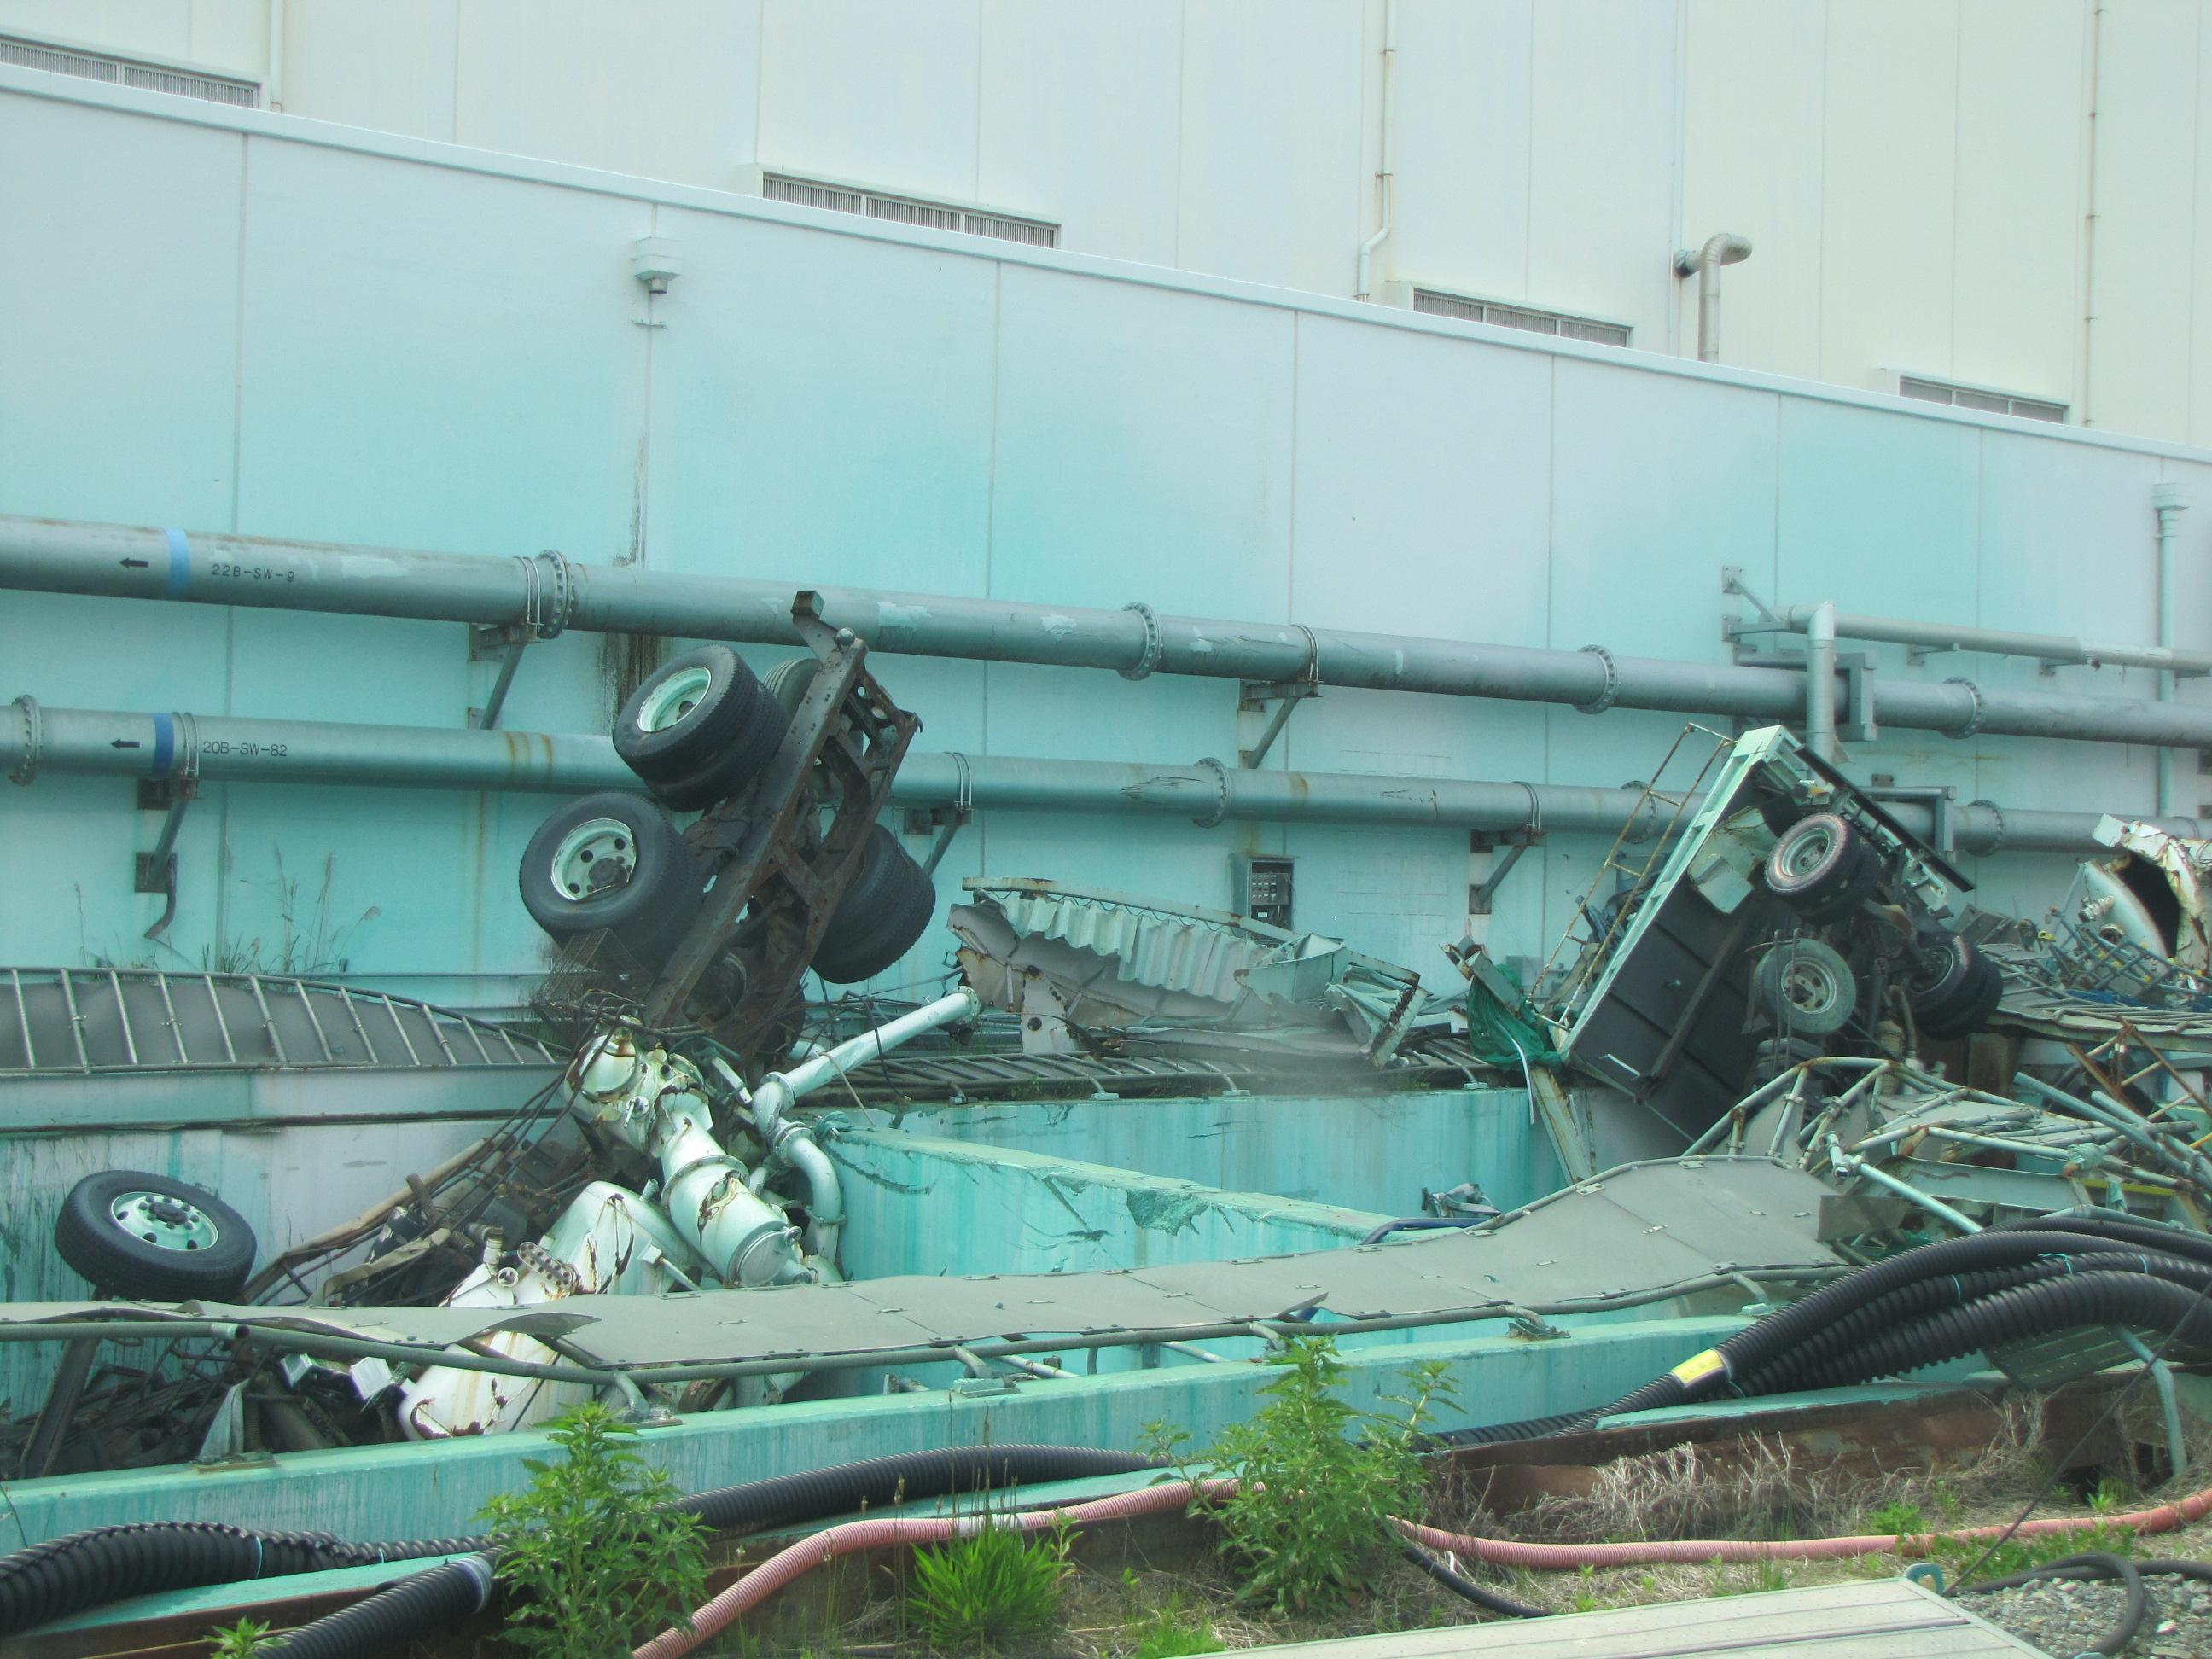 Reactor4 still remains frail for Tsunami4